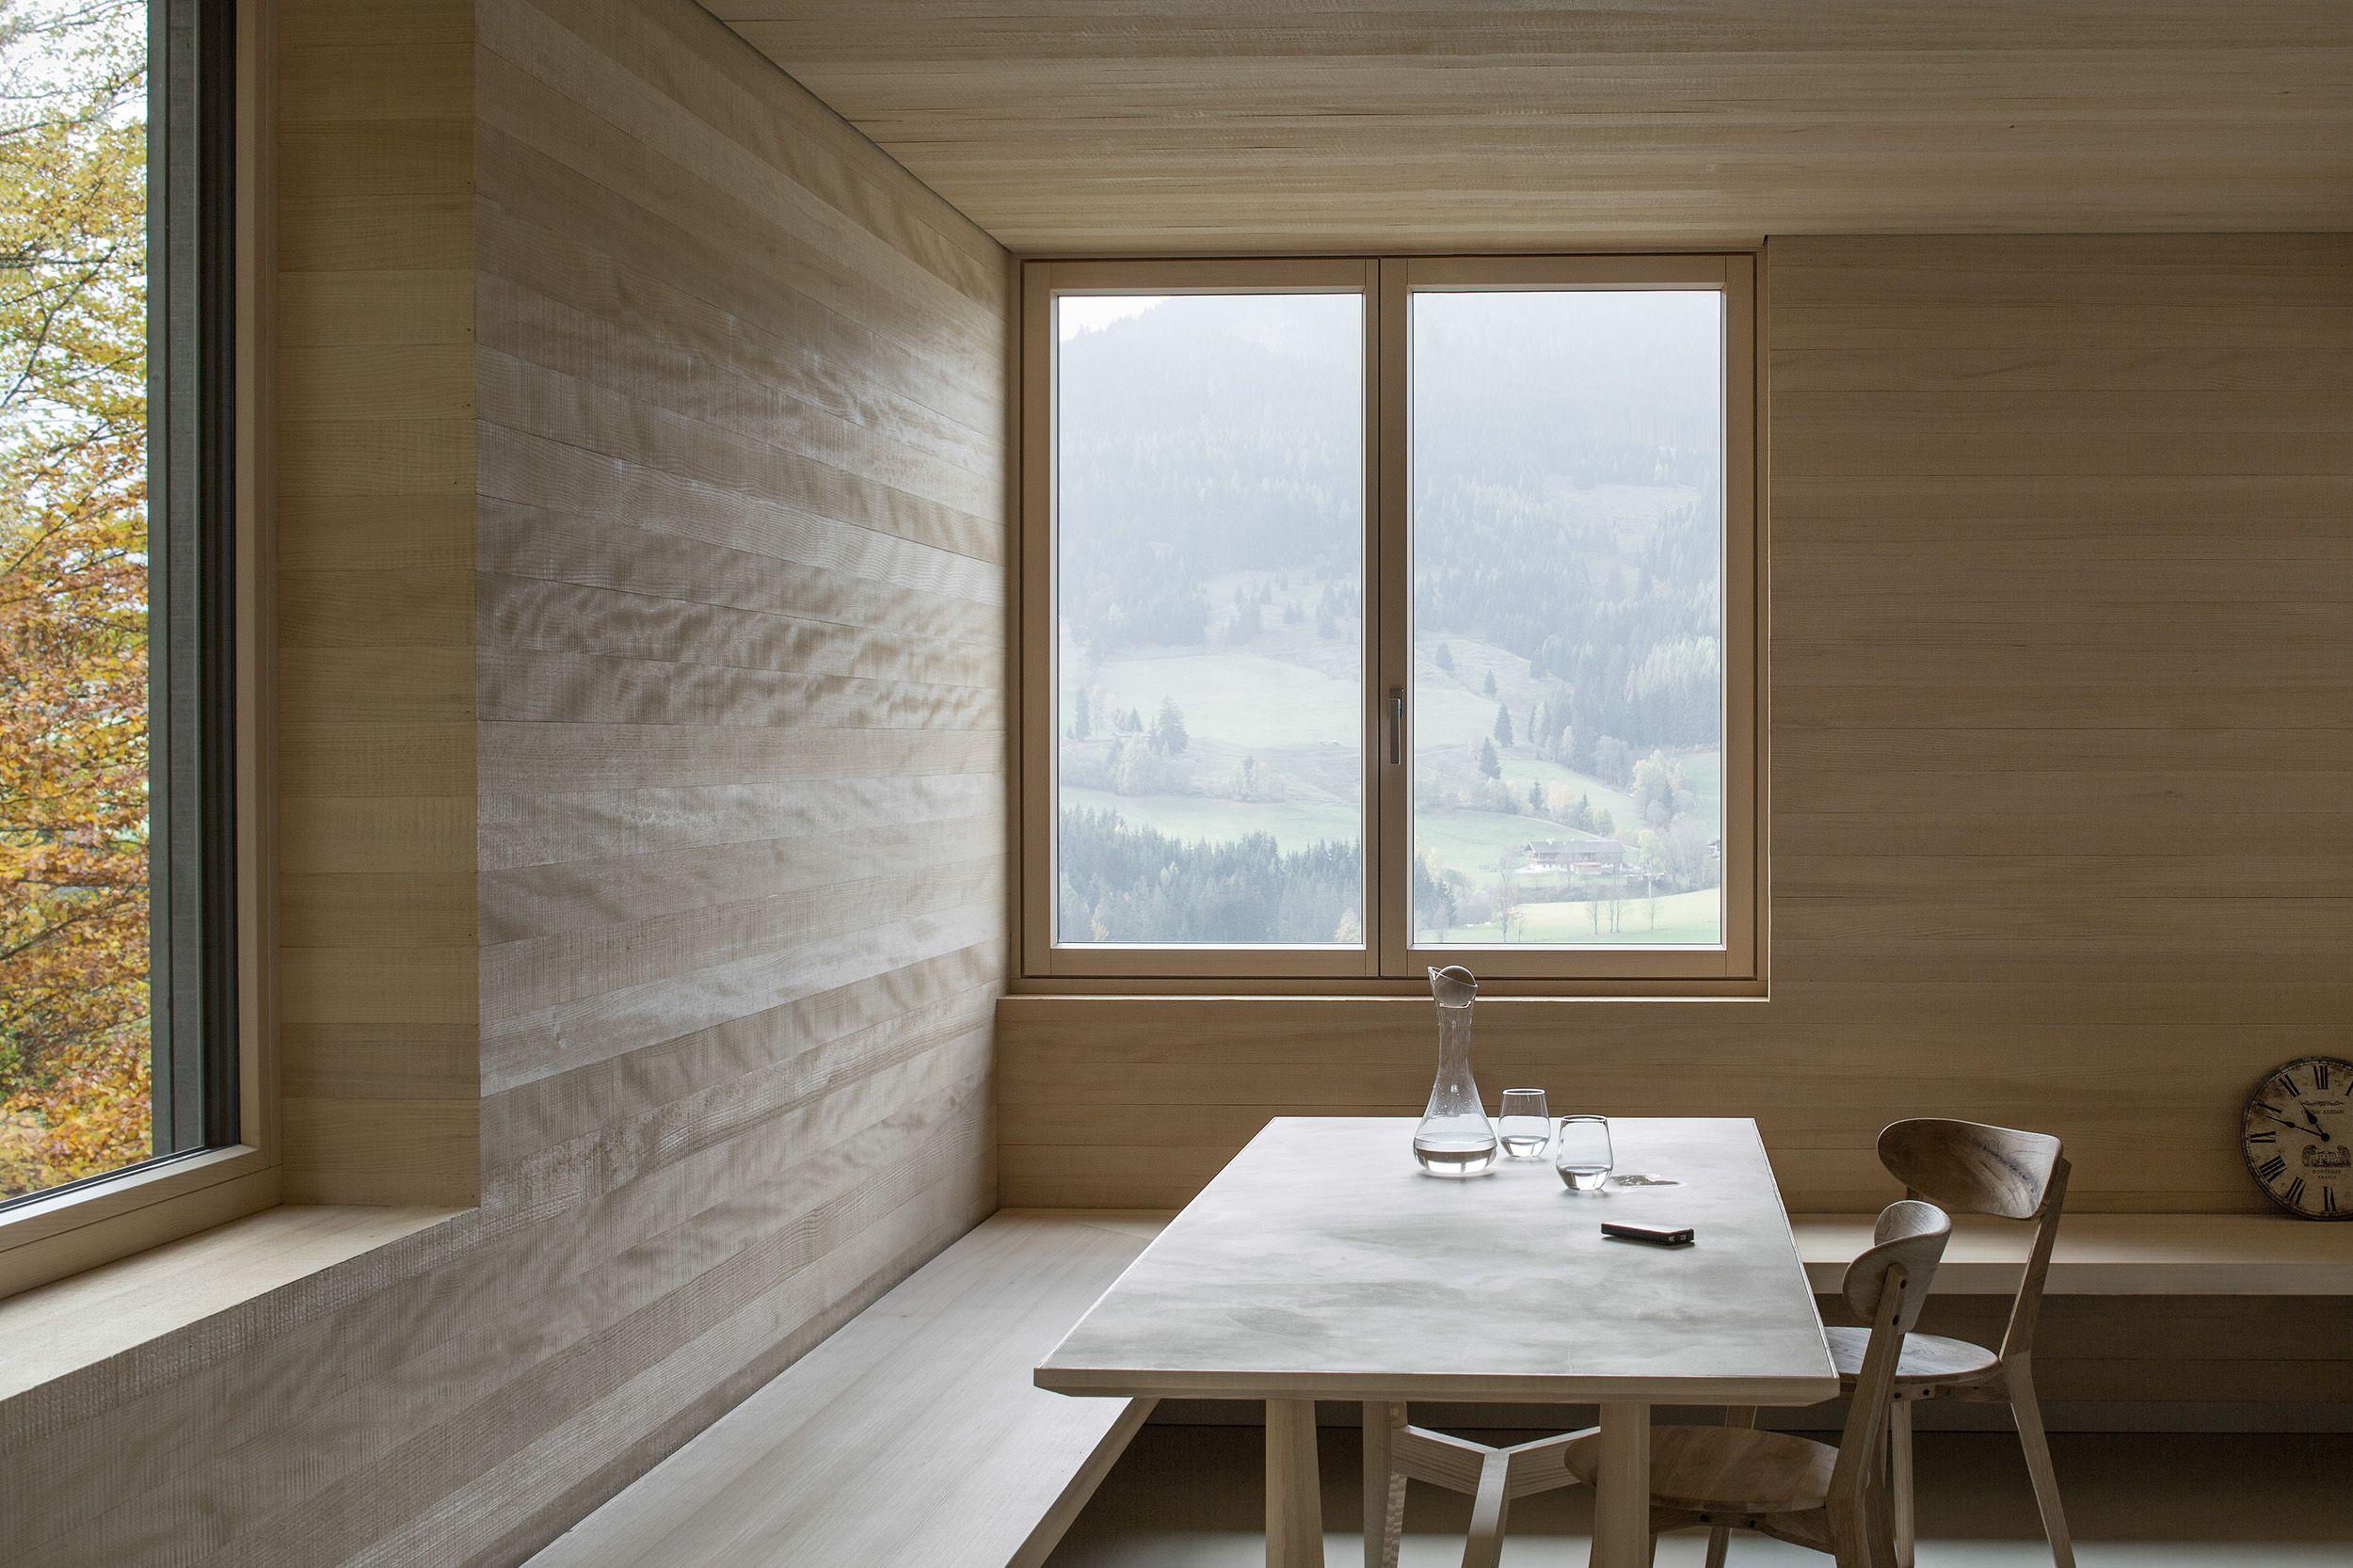 exponierte hanglage kompaktes einfamilienhaus in leogang - Farbakzente Interieur Einfamilienhaus